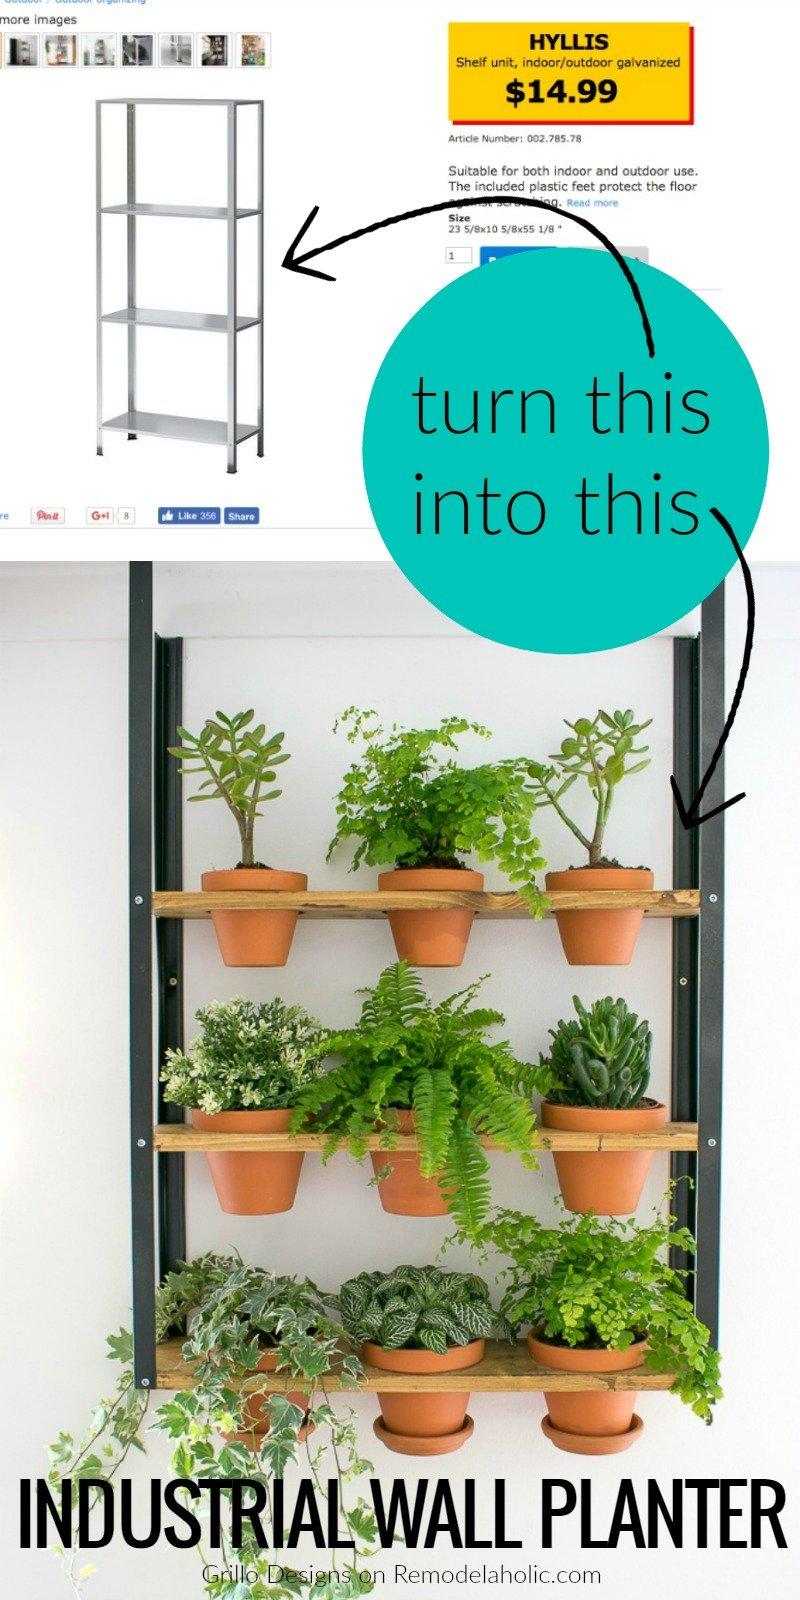 Remodelaholic ikea hyllis hack industrial wall planter for Garden design hacks